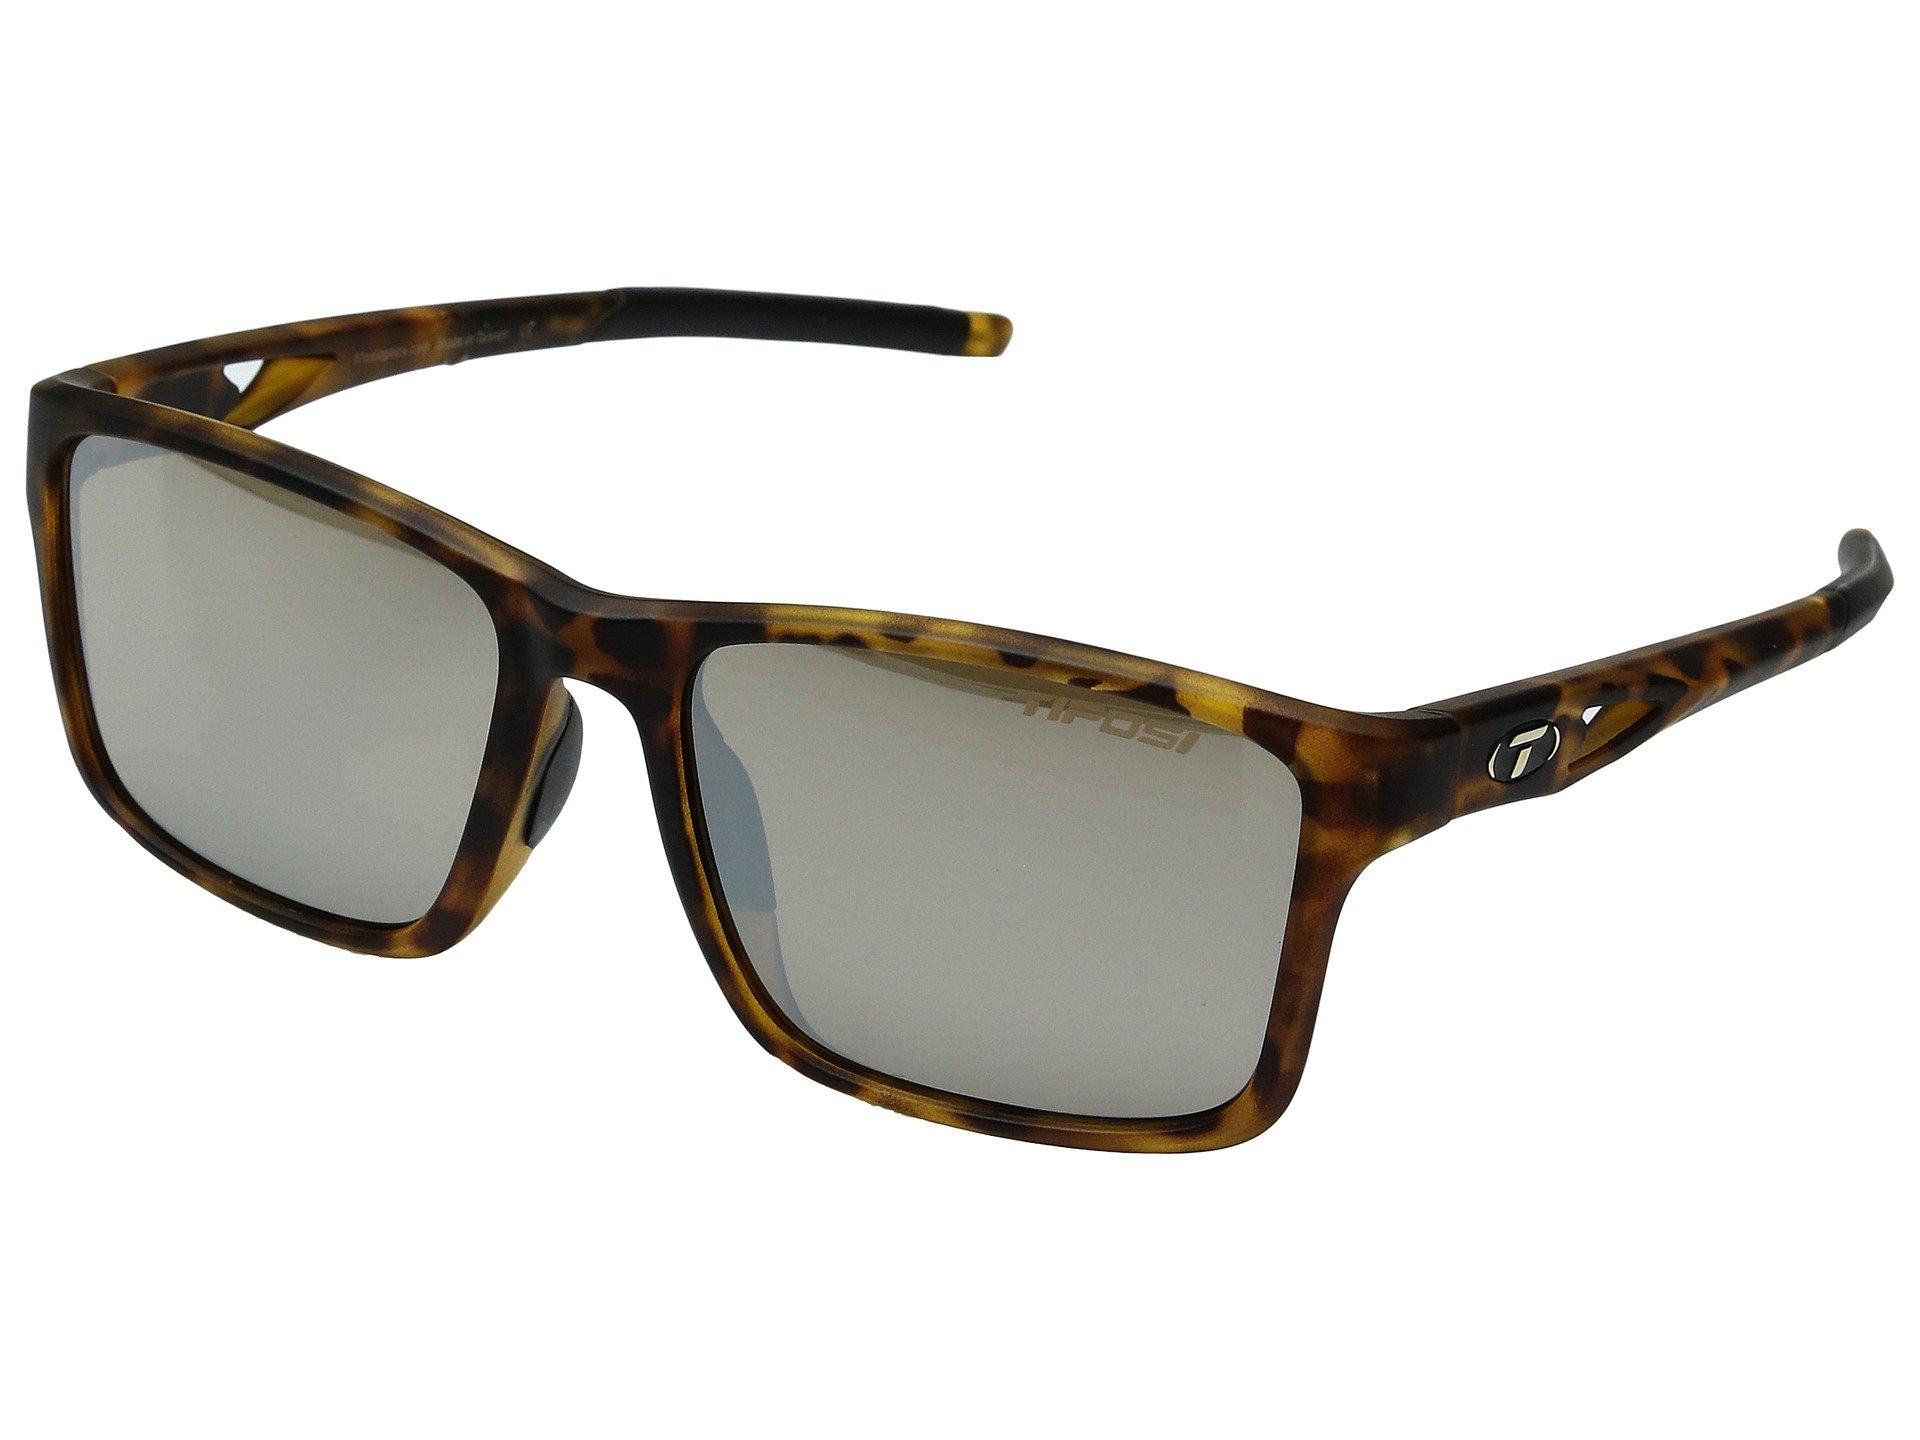 a29aed448d Men s Tifosi Optics Sunglasses + FREE SHIPPING